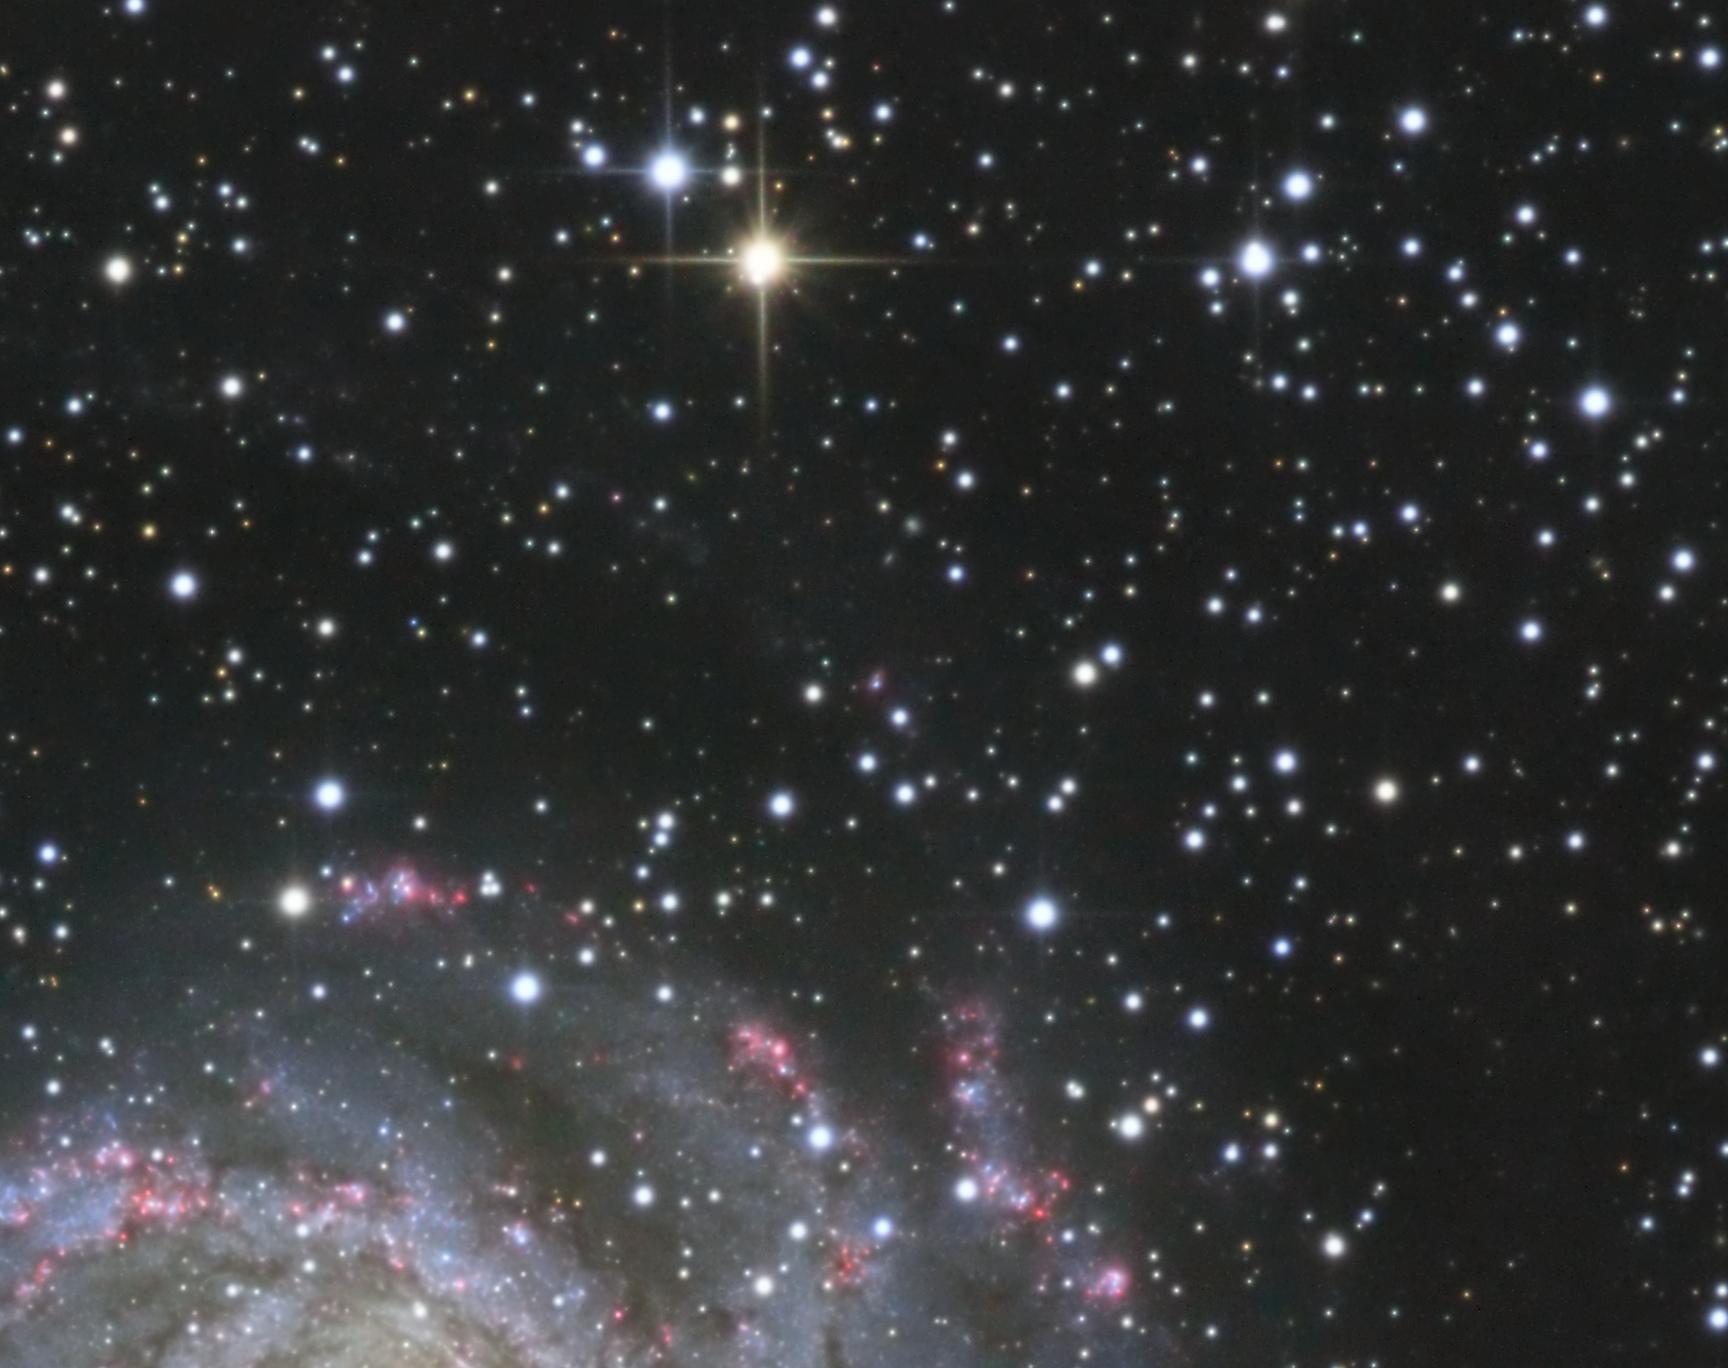 NGC_6946_Red_Ellipse.jpg.2cc363d8657bea500370b4b53c5eaca7.jpg